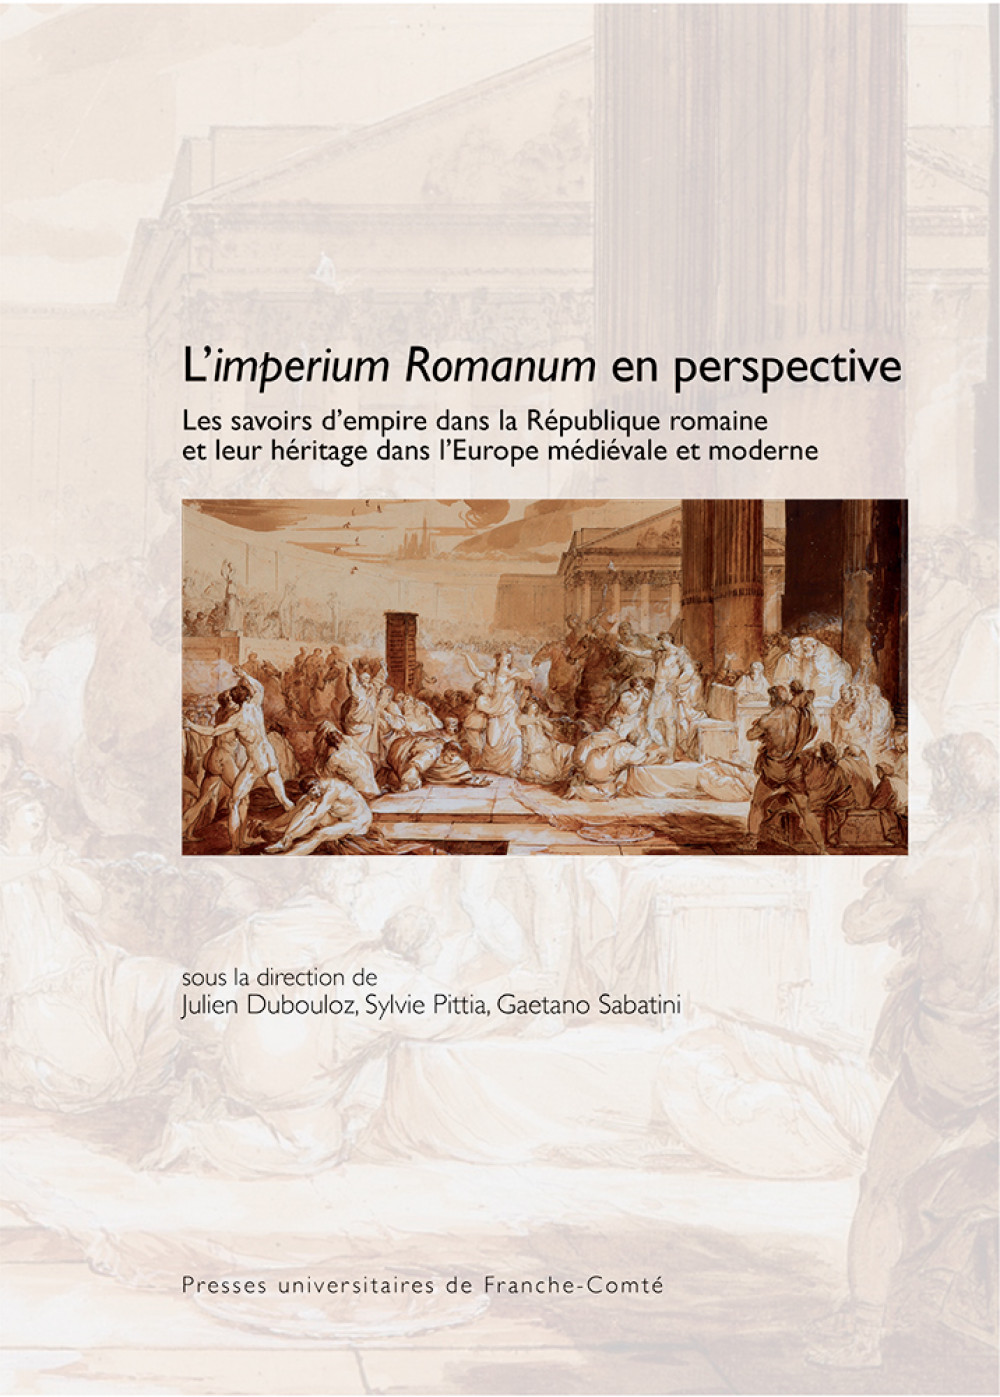 L'imperium romanum en perspective